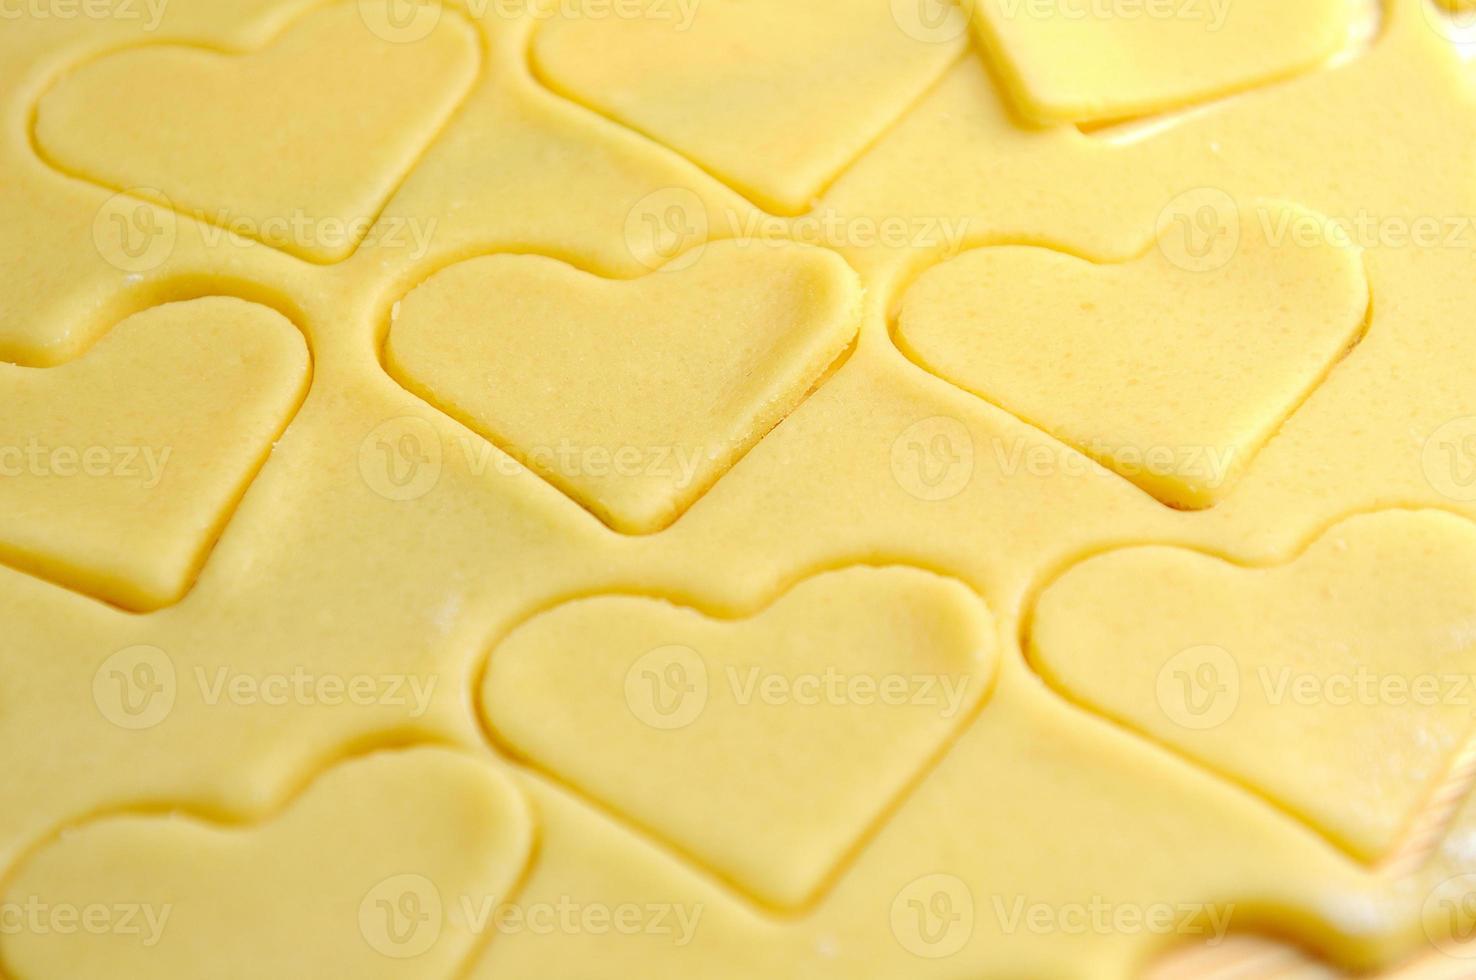 hornear galletas de corazón para san valentín foto